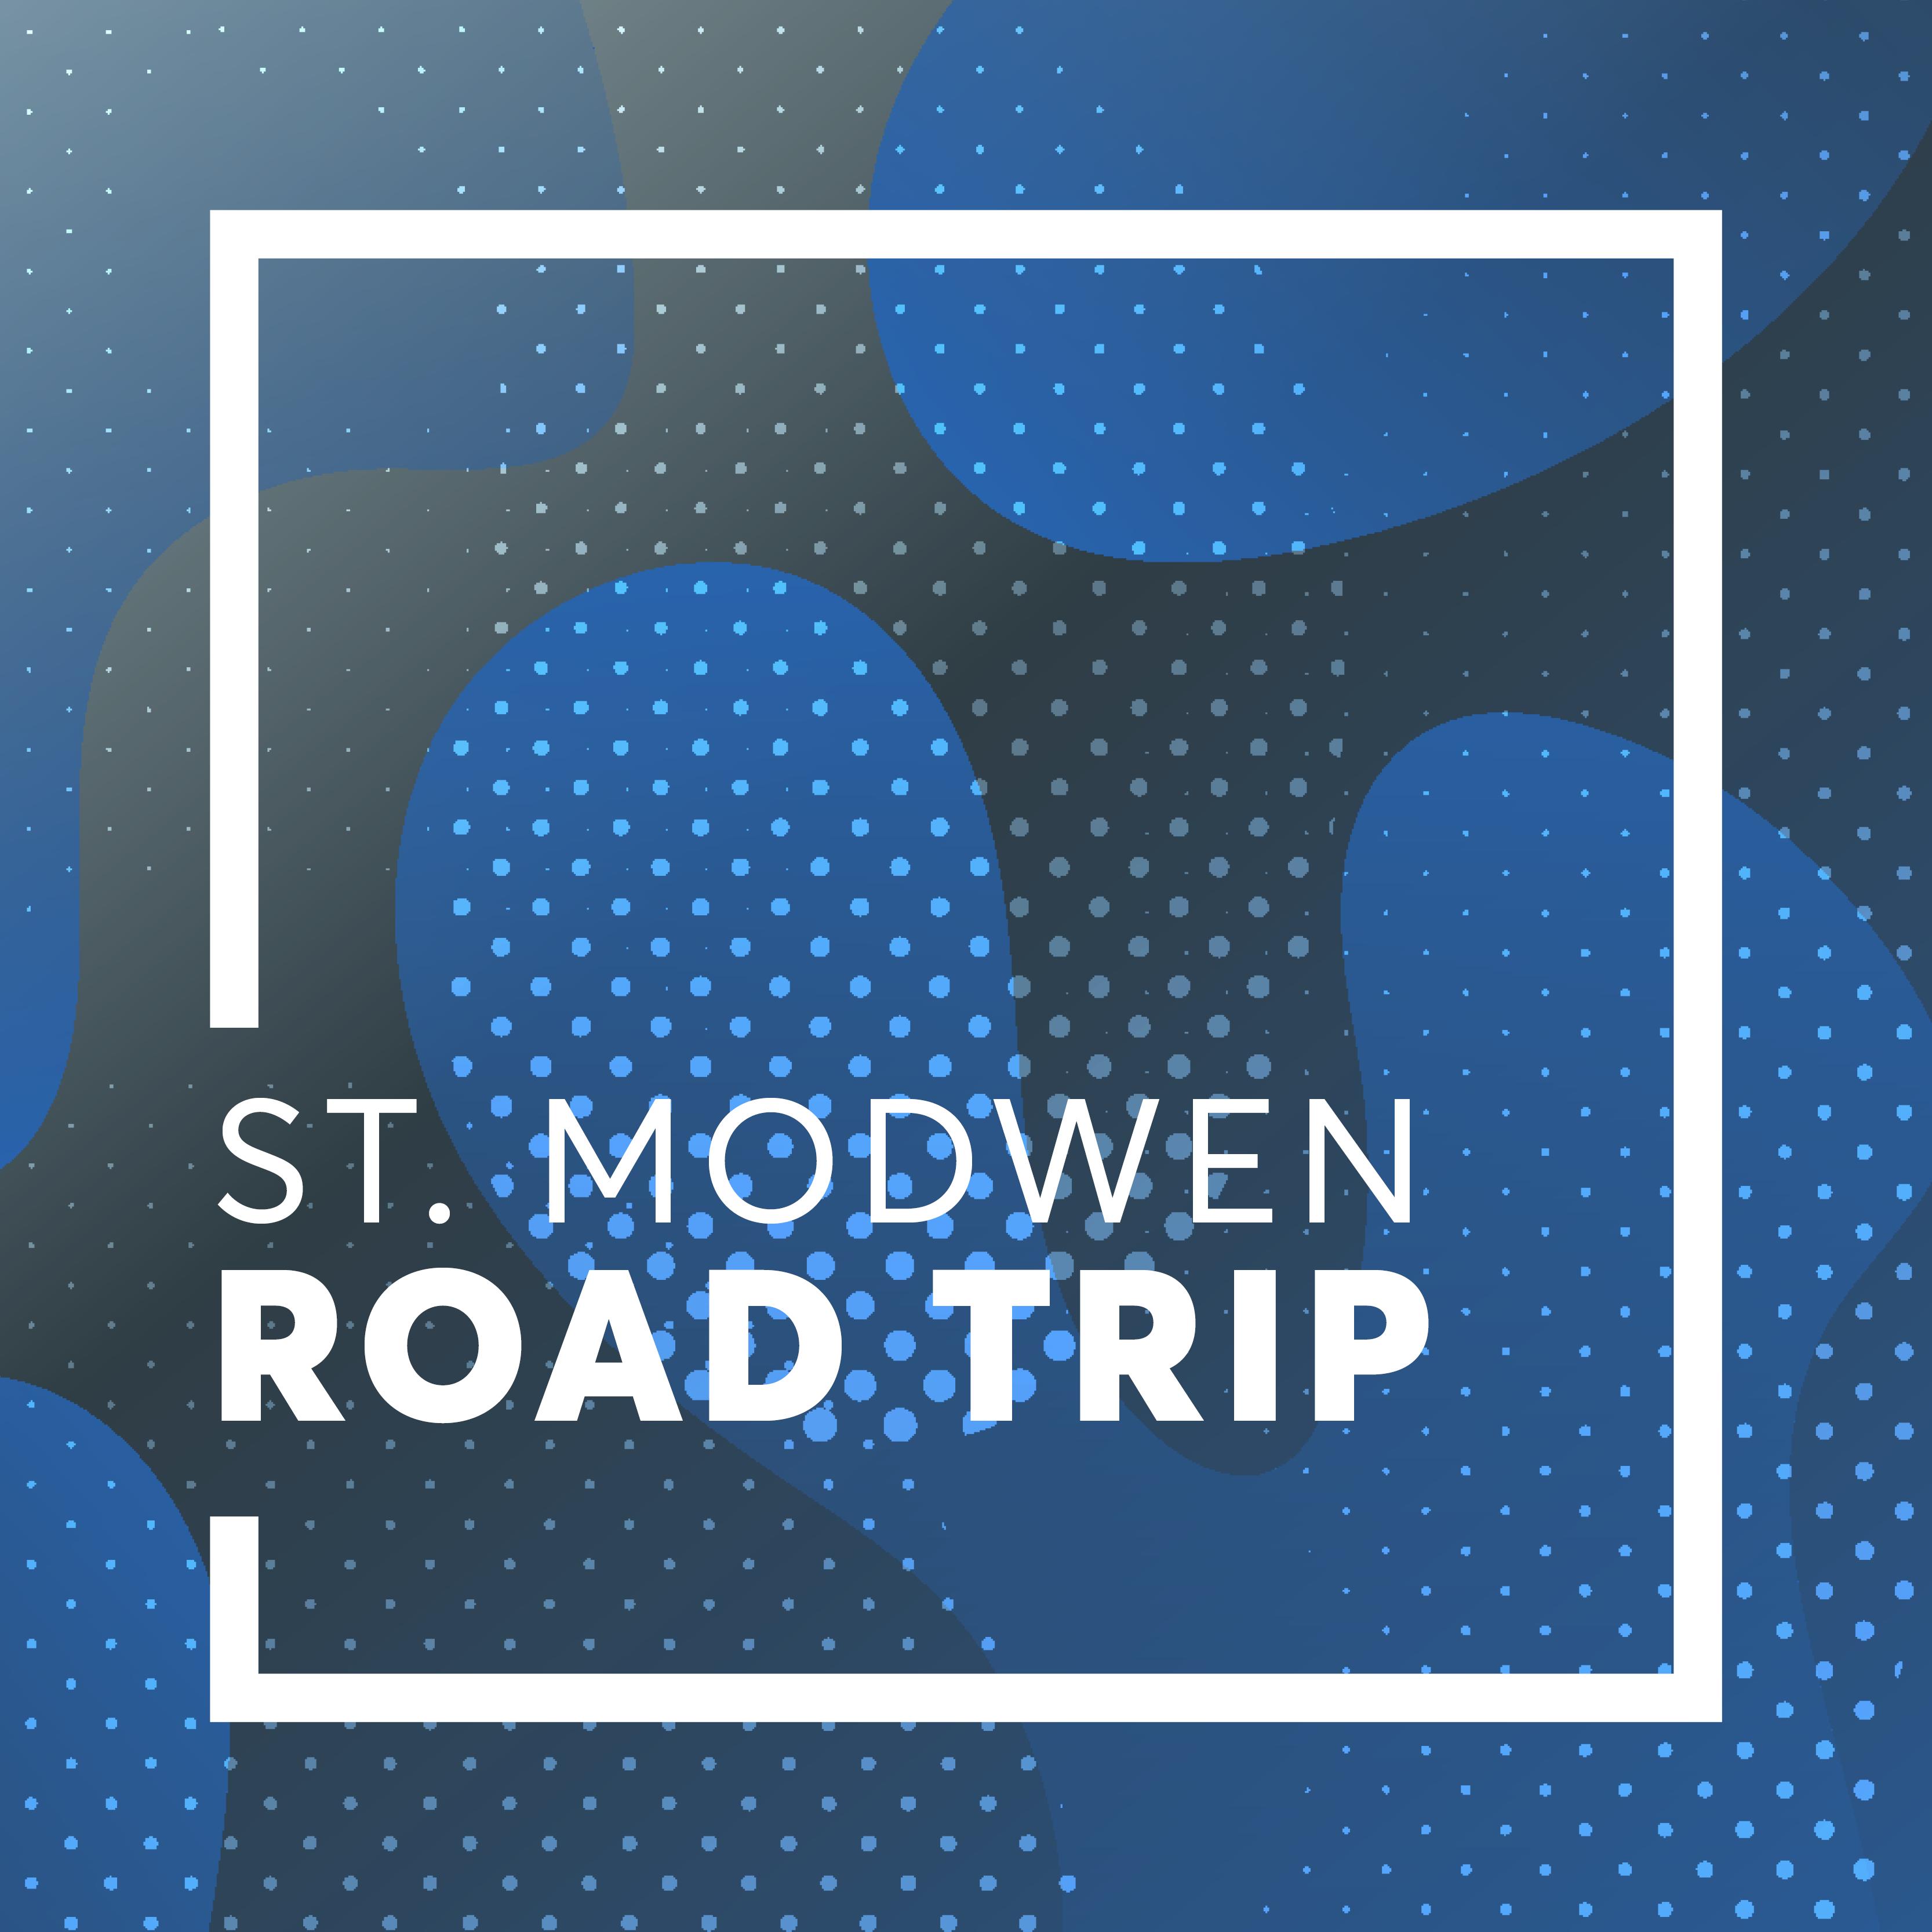 🔊 Playlist: St. Modwen Roadtrip